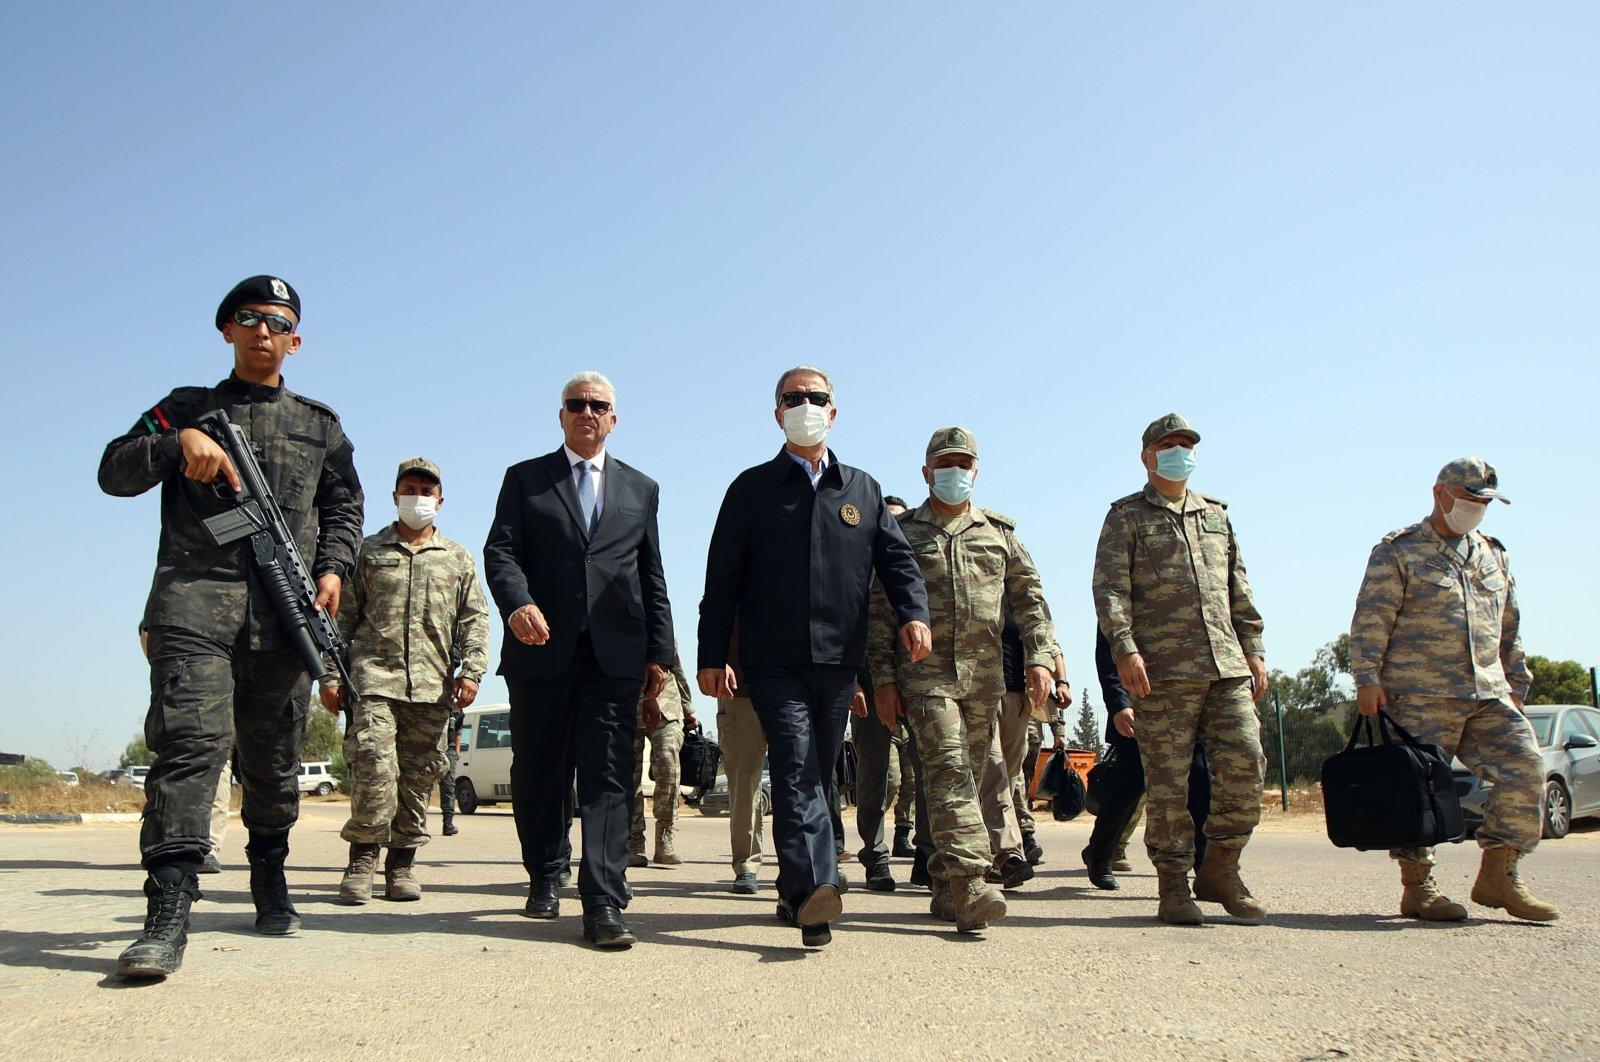 Defense Minister Hulusi Akar walks alongside Libyan officials during a visit to Libya, July 6, 2020. (AA Photo)